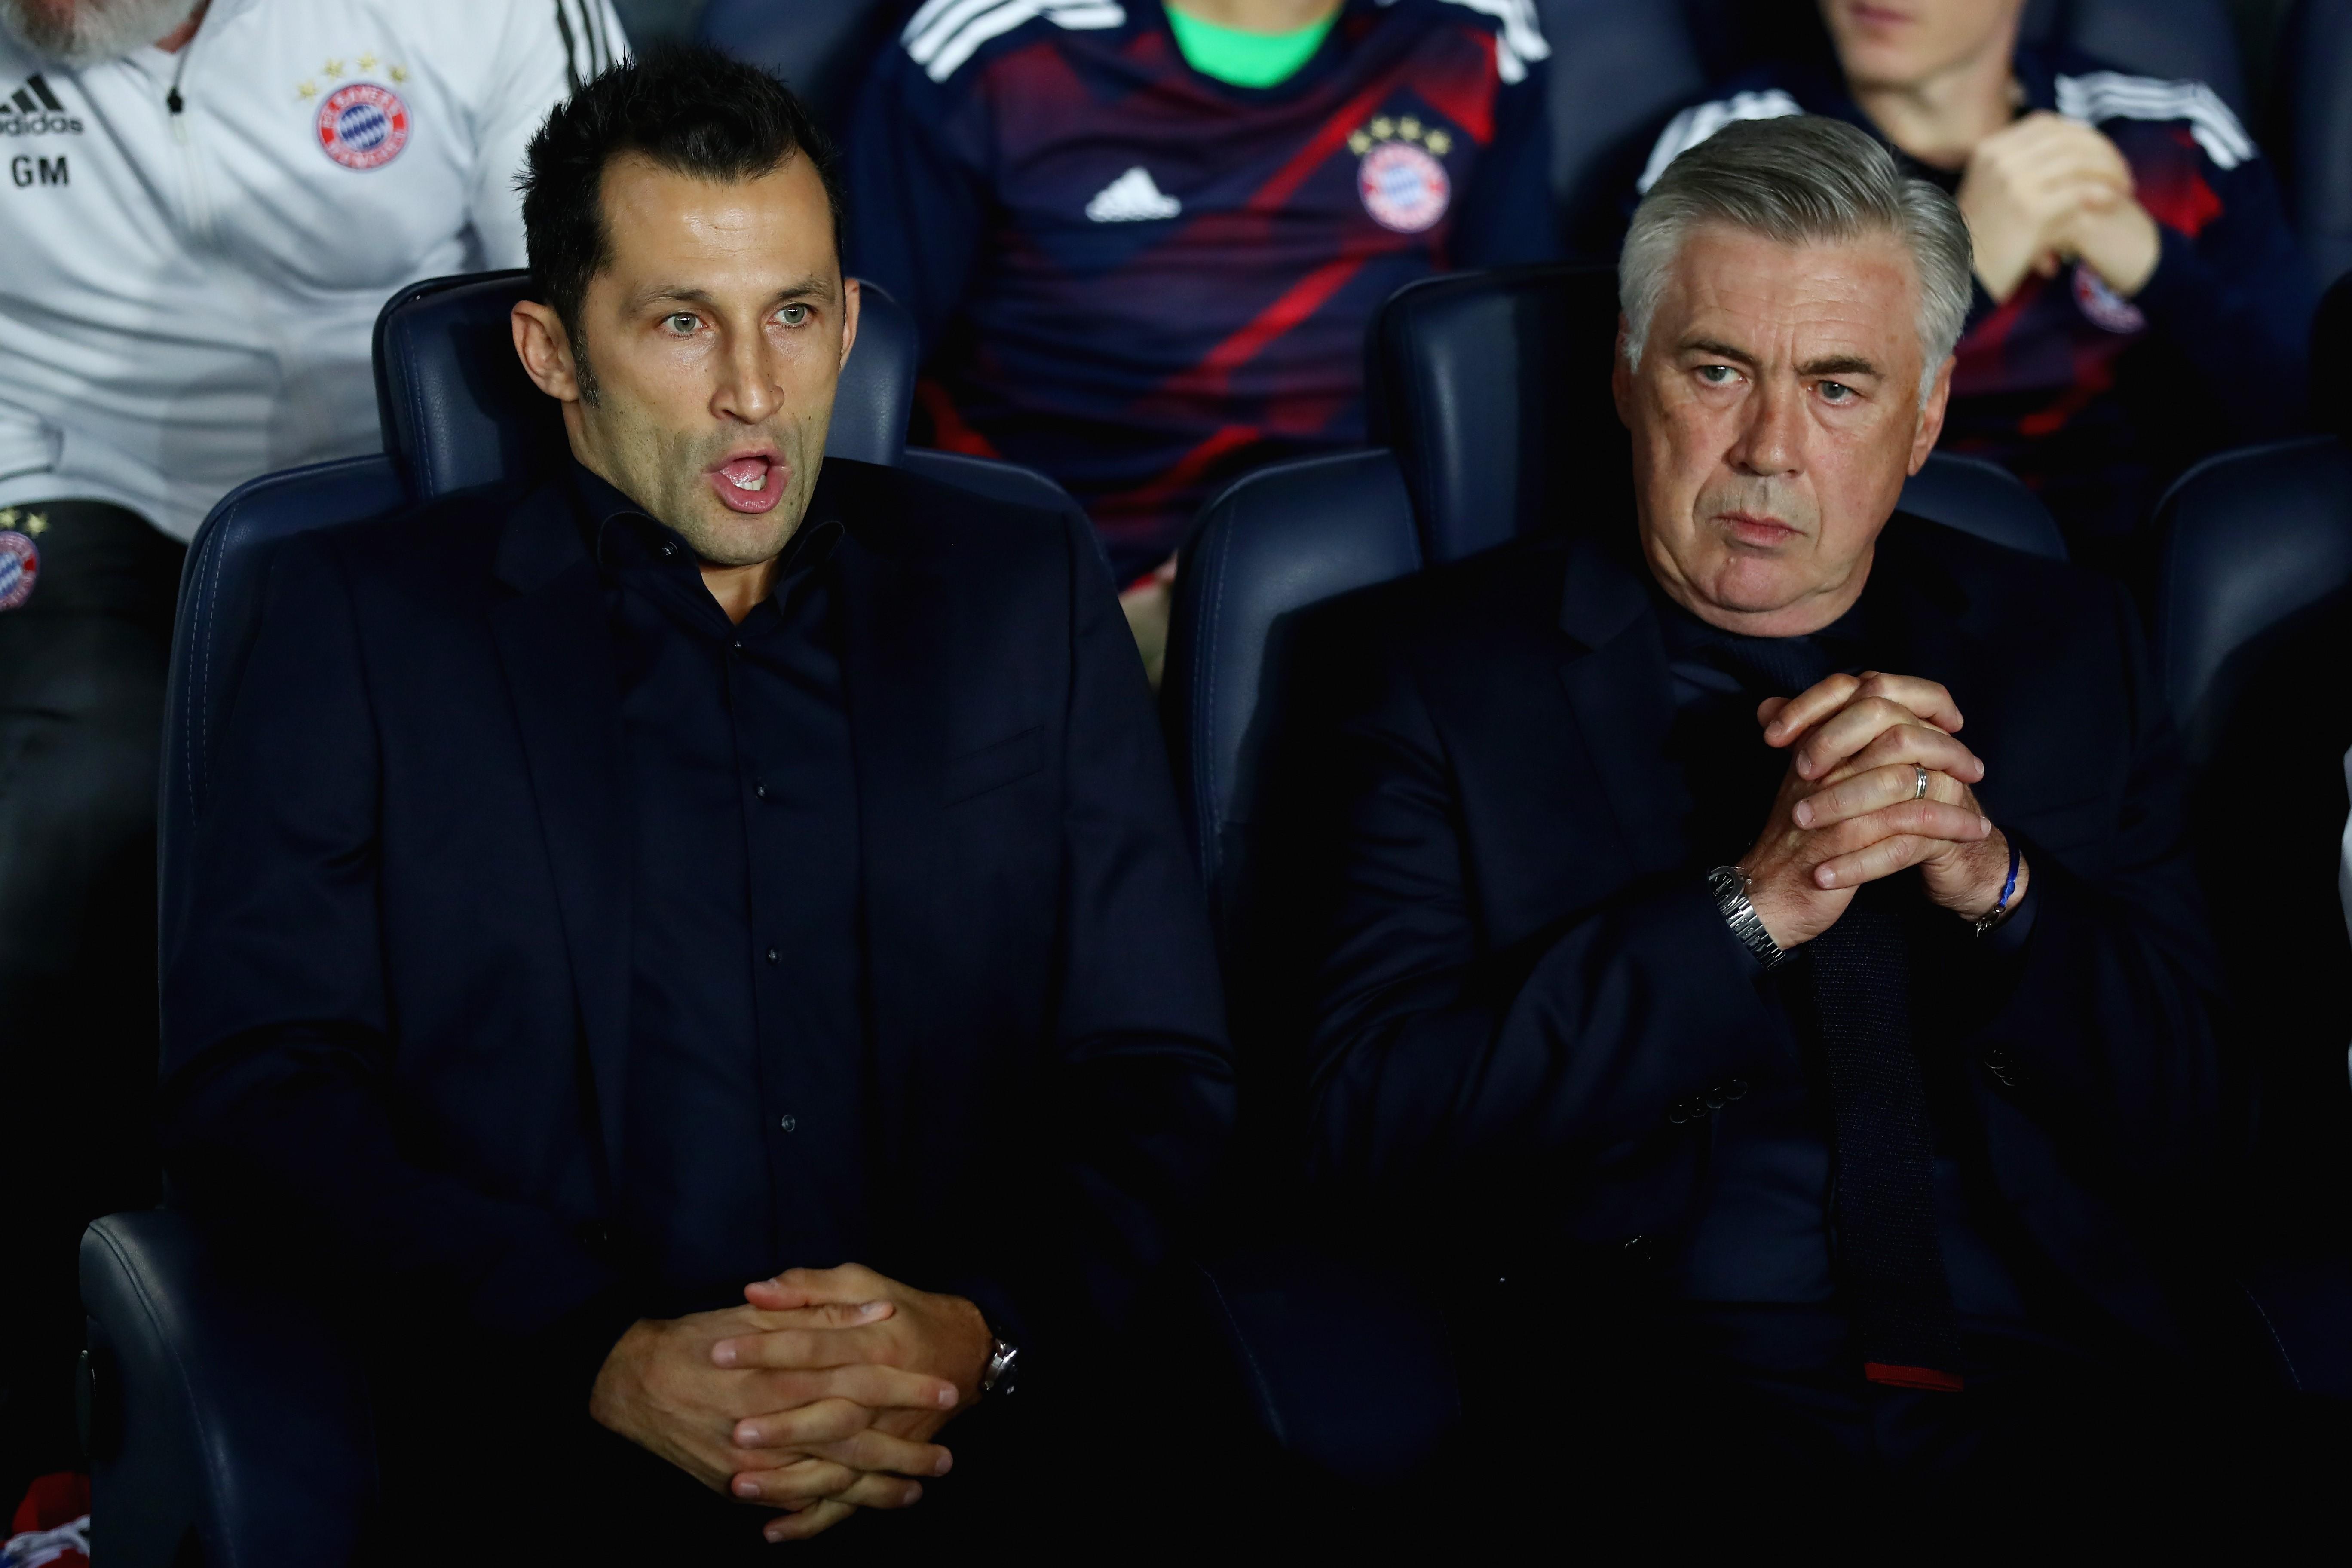 Carlo Ancelotti et Hasan Salihamidžić lors de PSG / Bayern en Ligue des champions